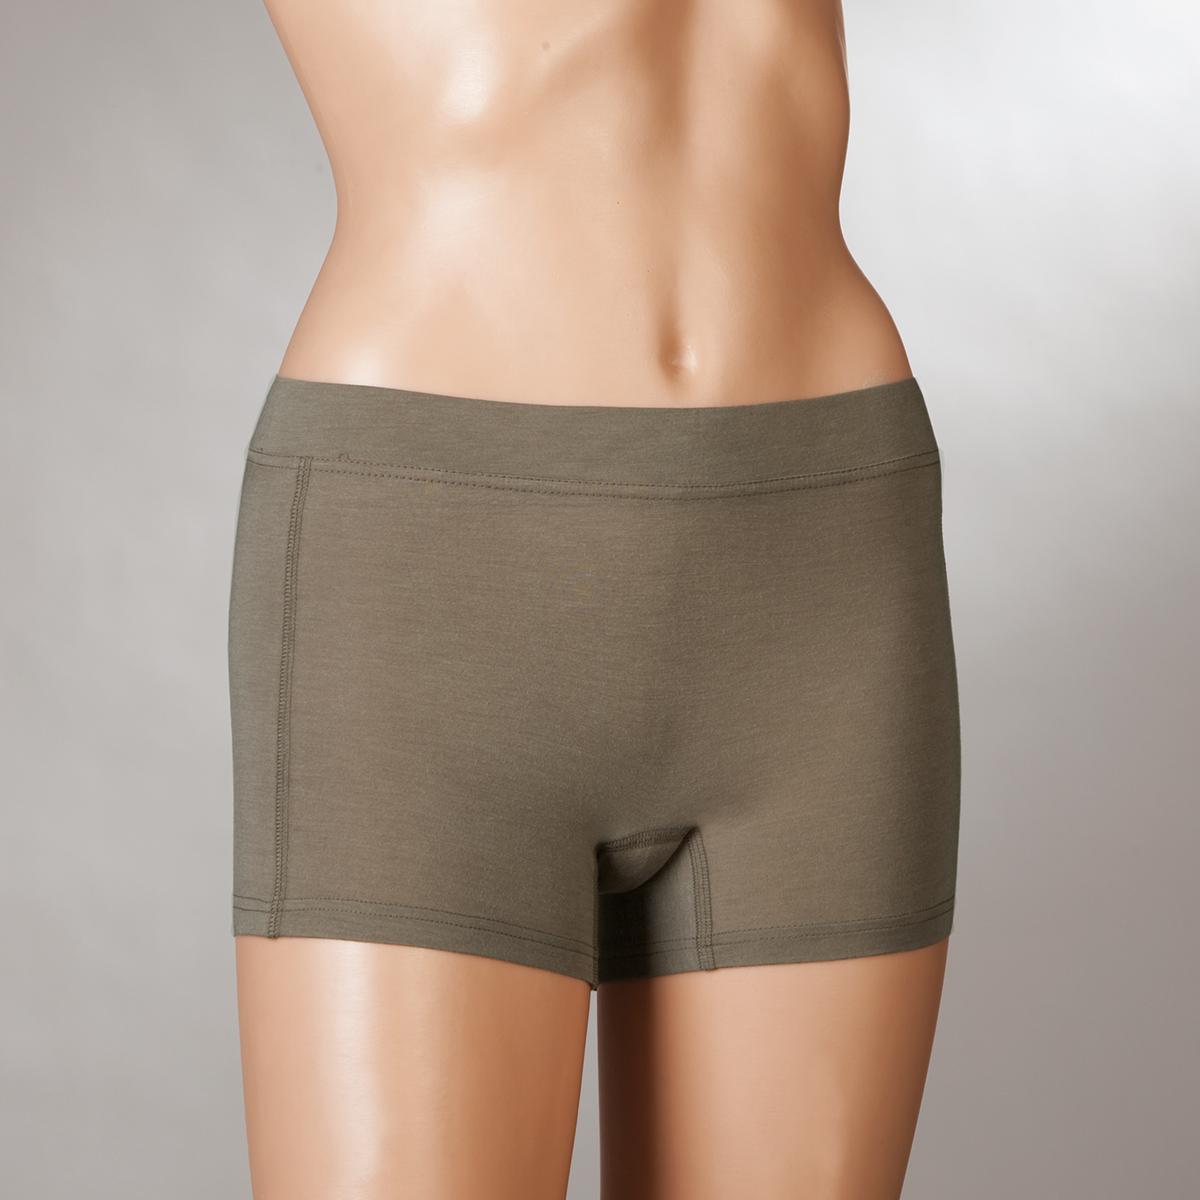 b.well Yoga Kleidung: Damen Panty